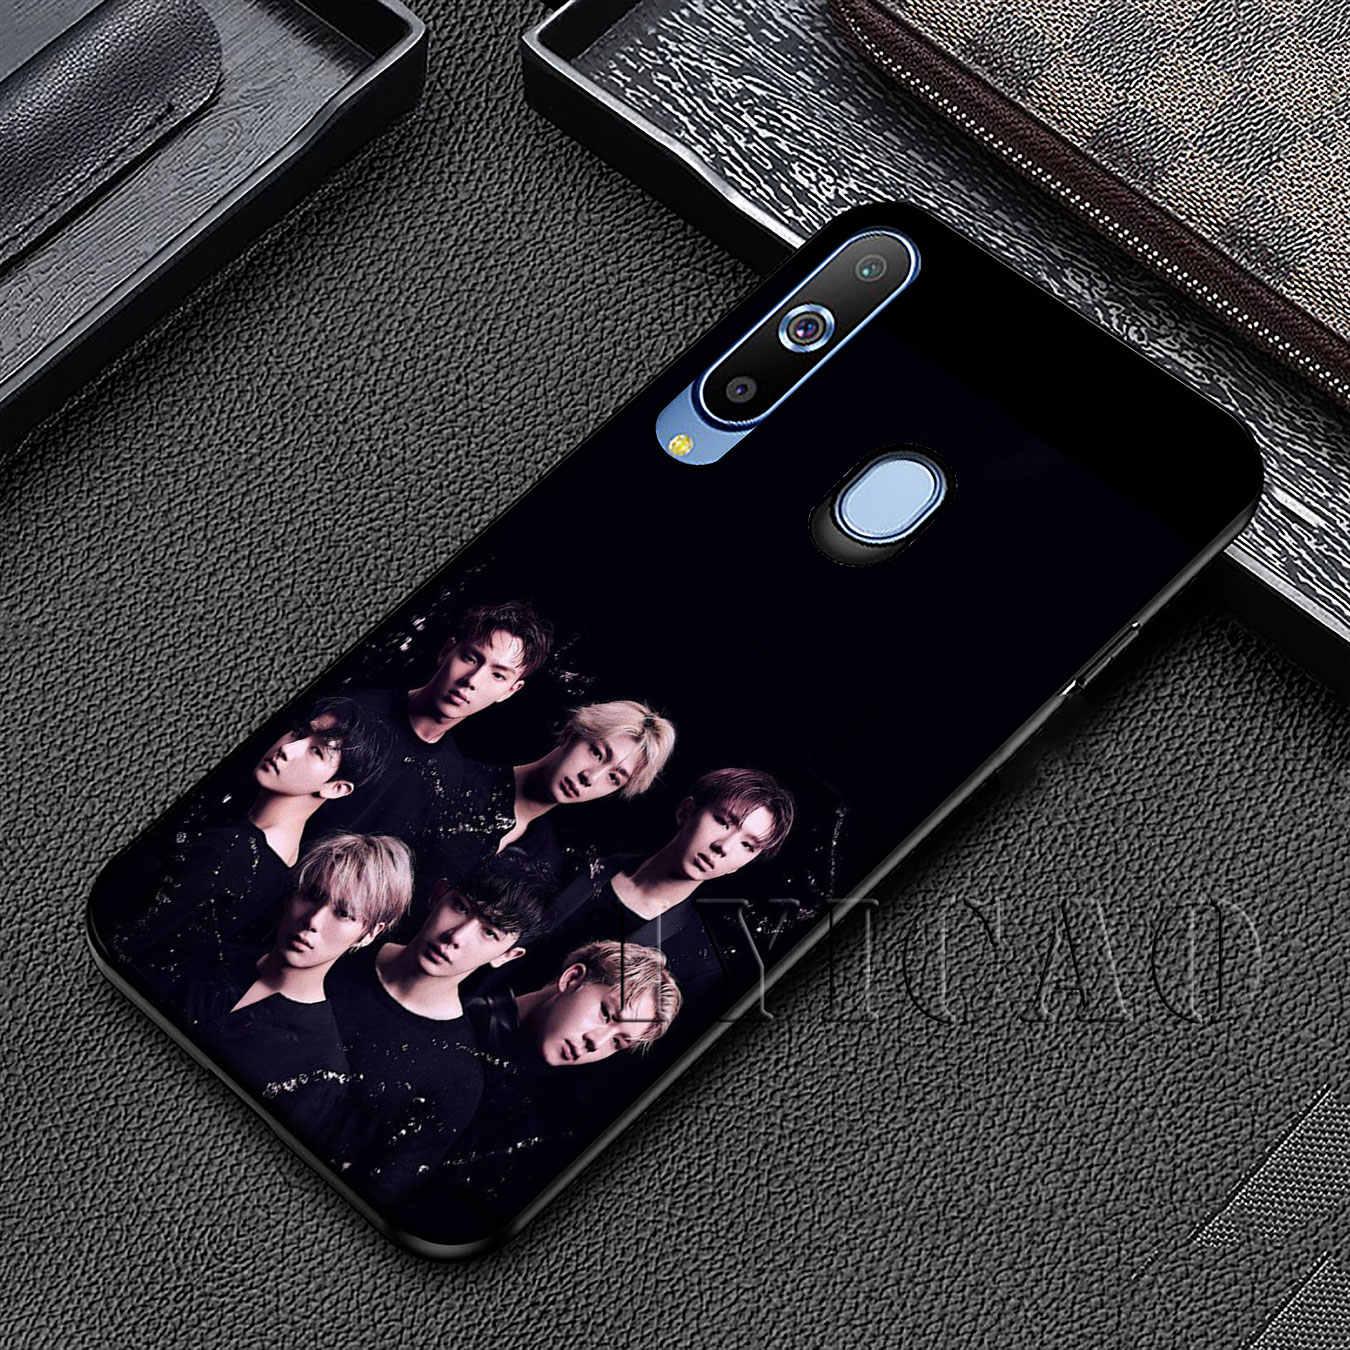 Balo Monsta X Silicone Mềm Dành Cho Samsung Galaxy Samsung Galaxy A70 A60 A50 A40 A30 A20 A10 M10 M20 M30 M40 A20E bao Da